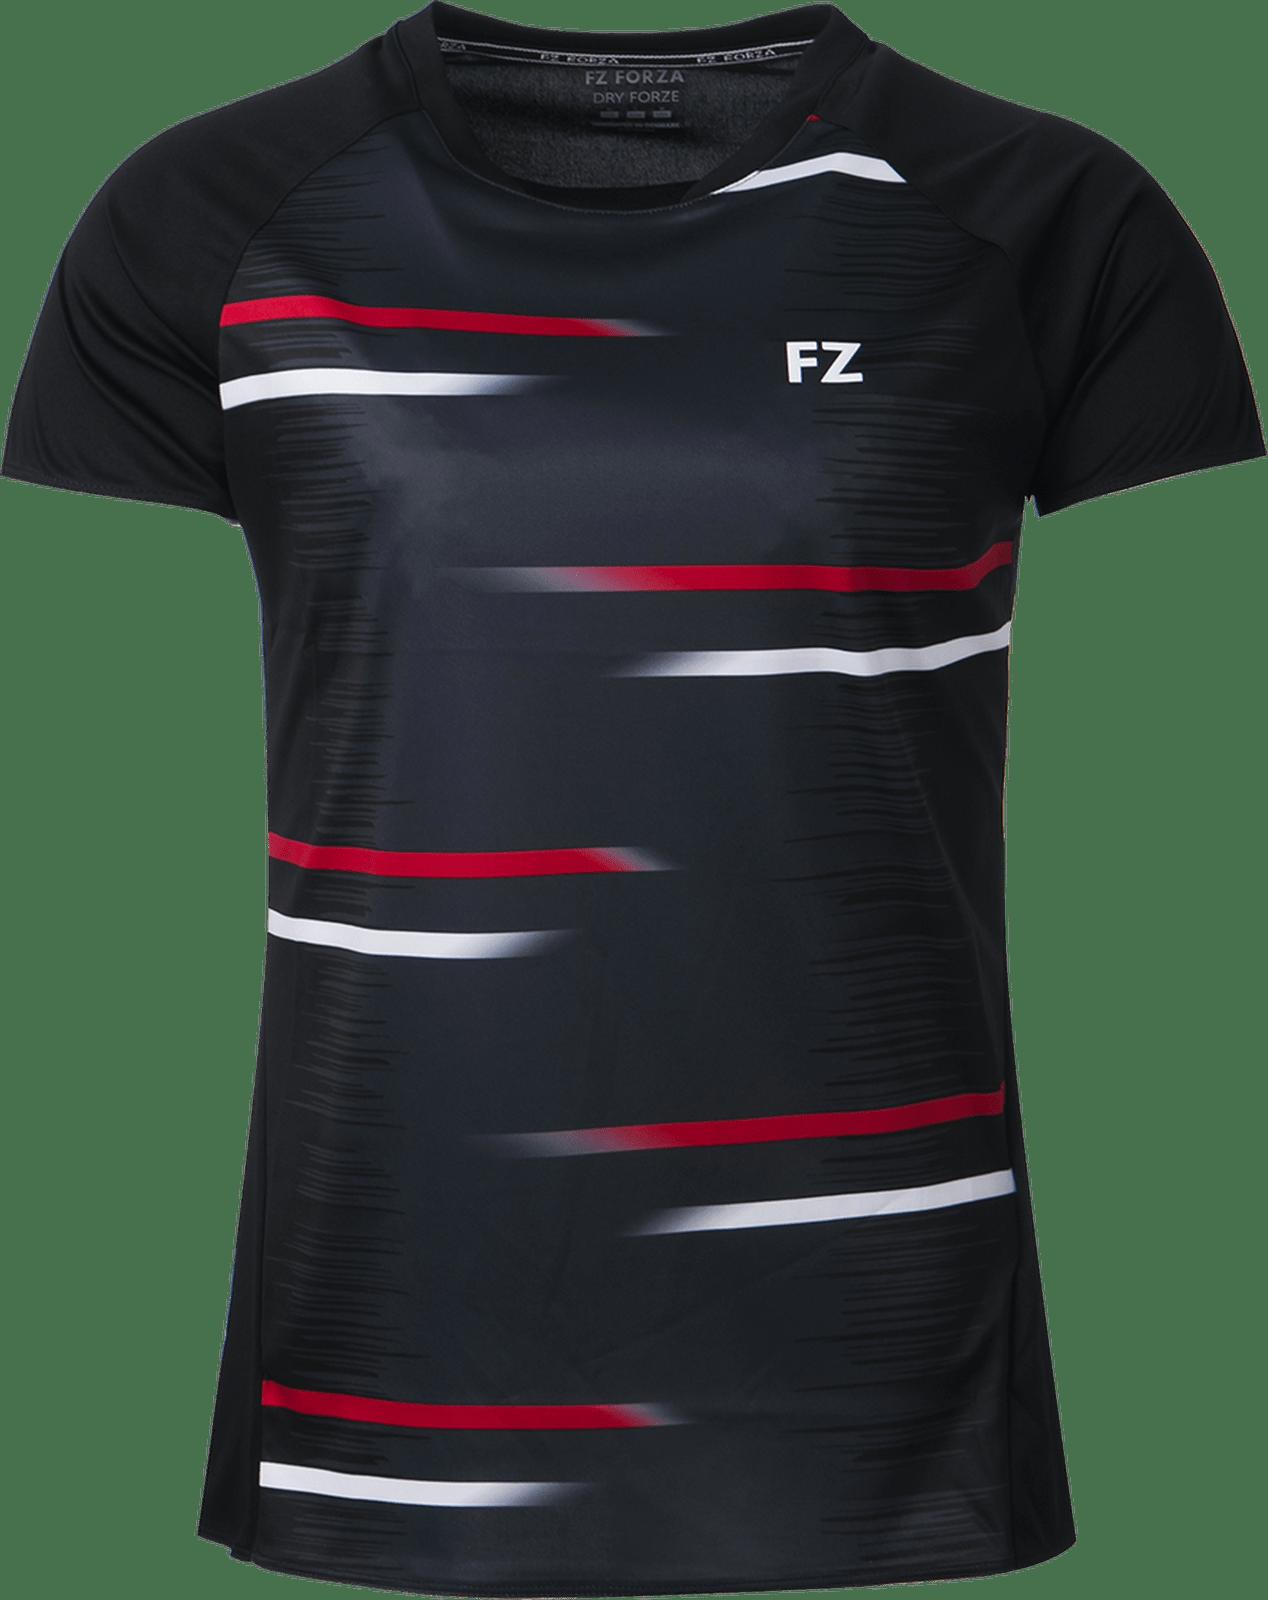 Forza Mobile W S/S Tee, 96 Black